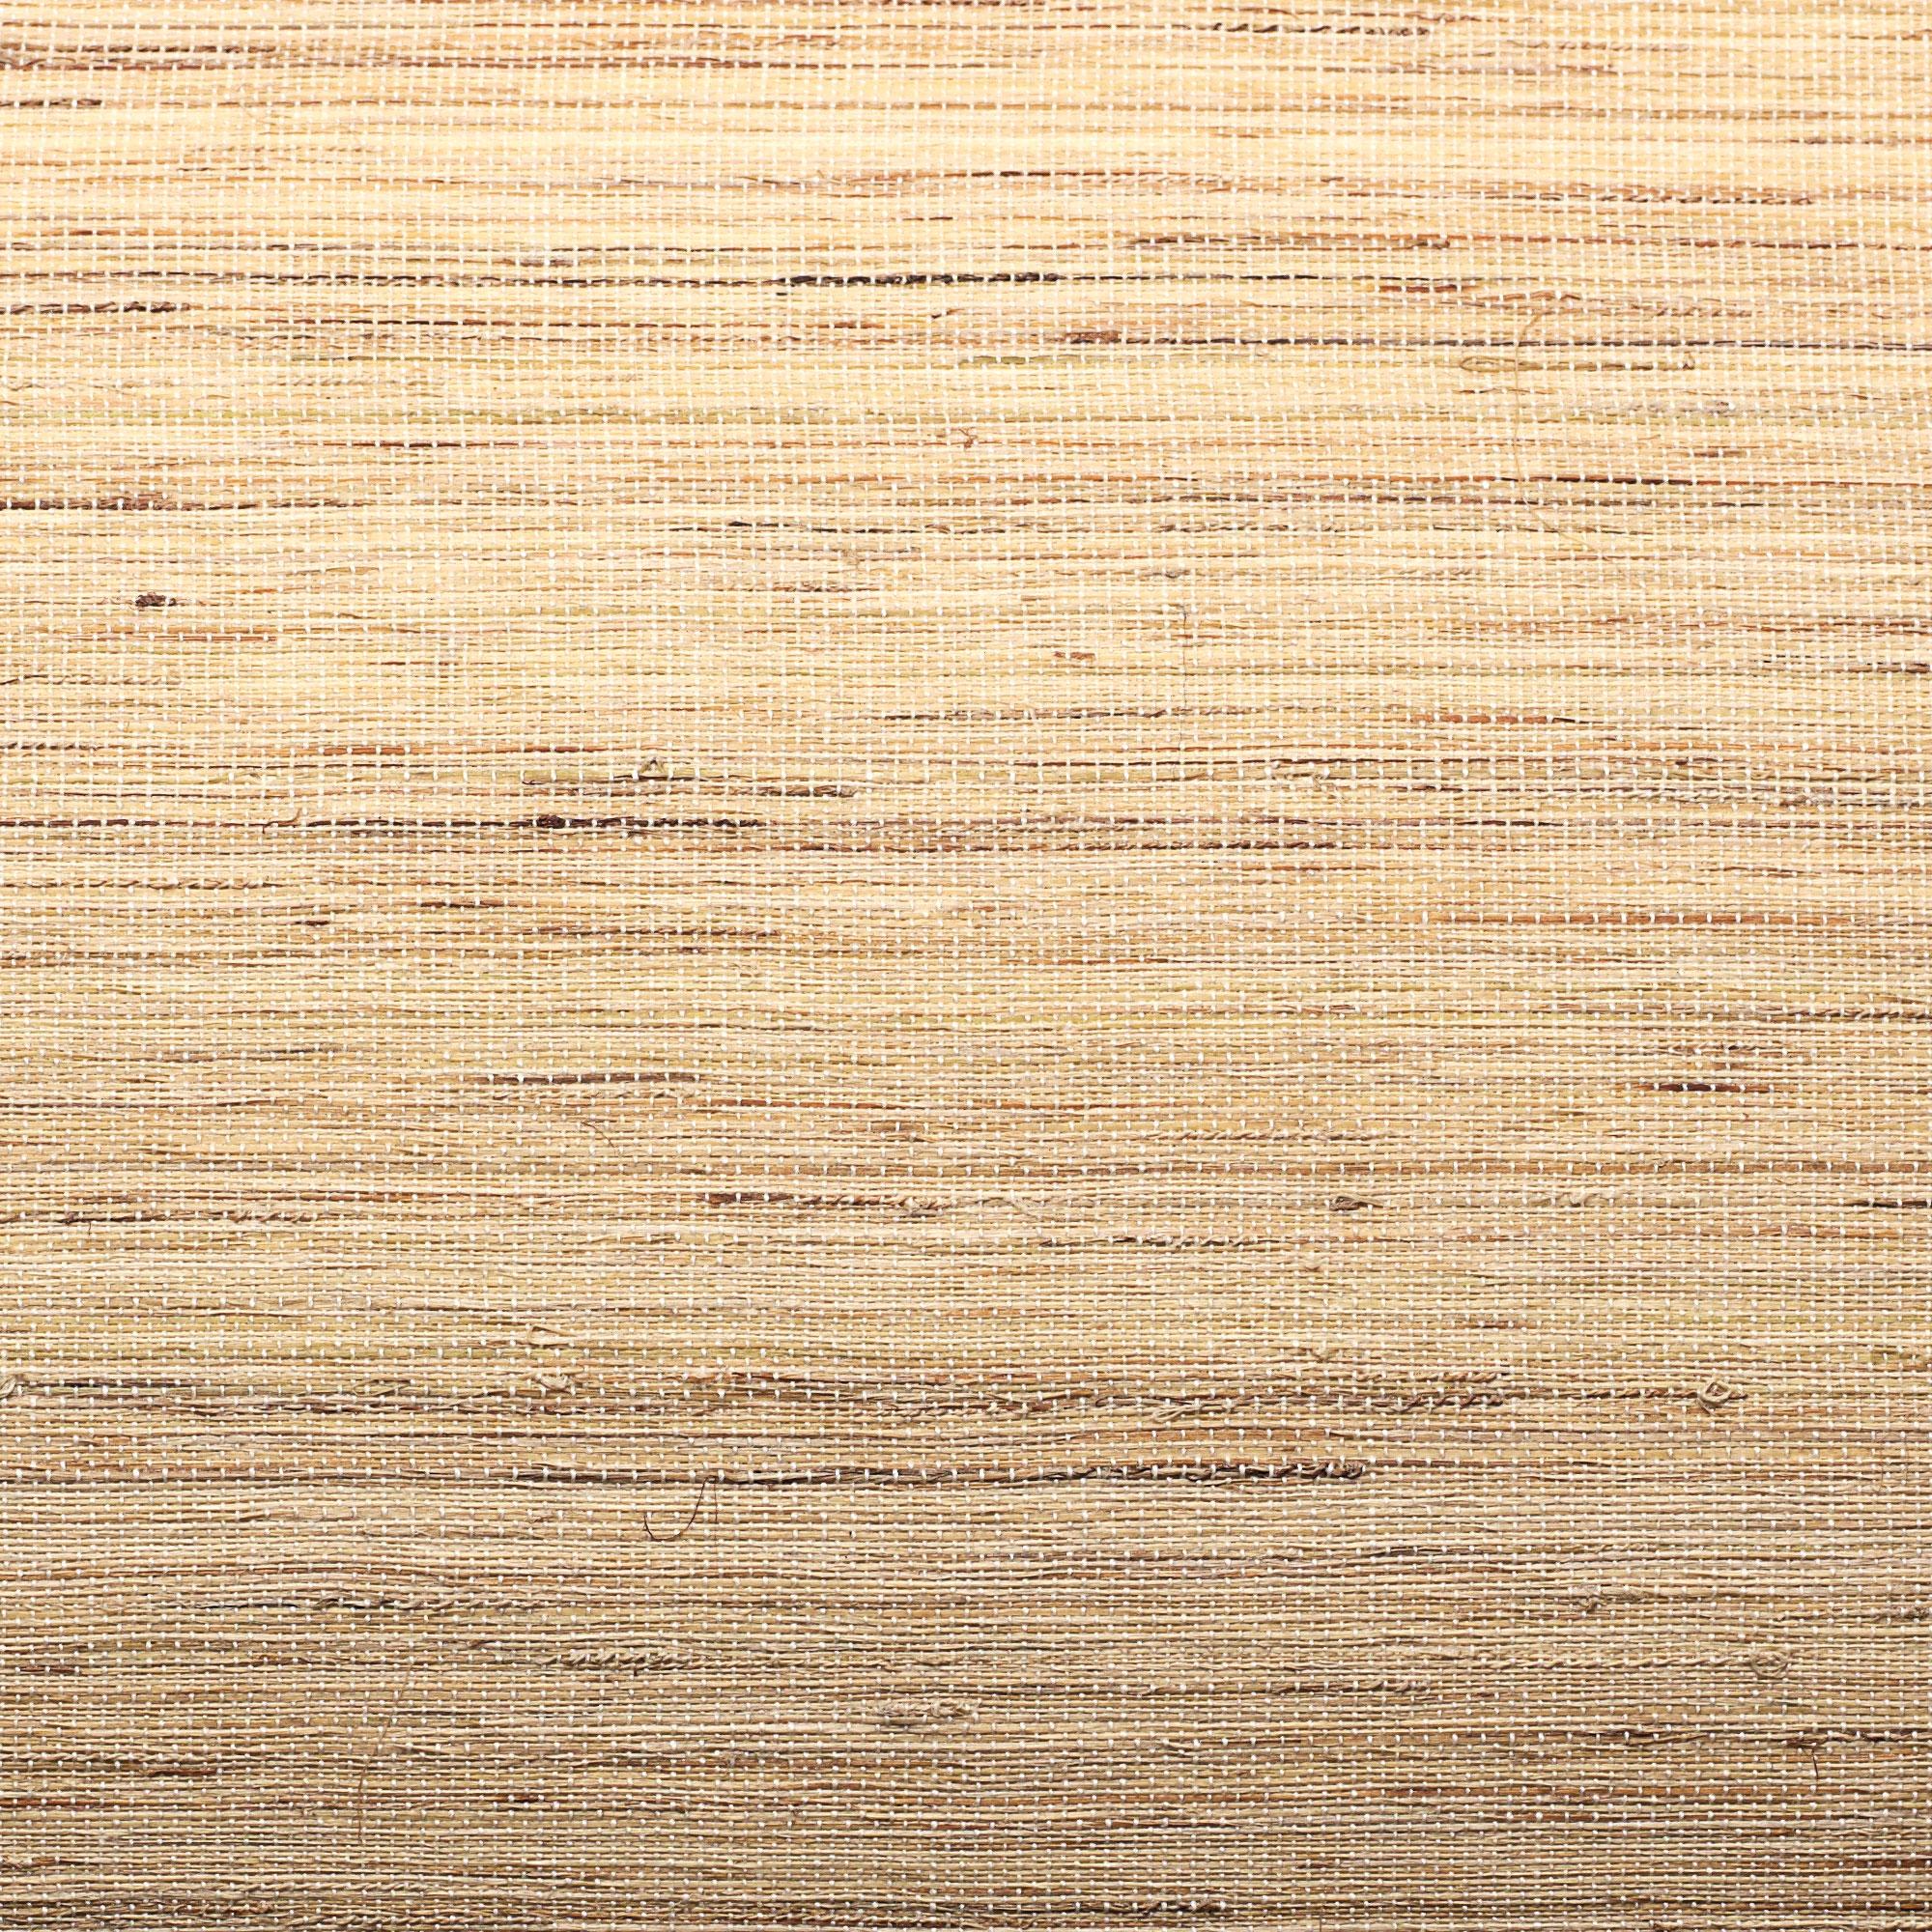 swatch-WL351-highdesert-palm-dunes-web.jpg